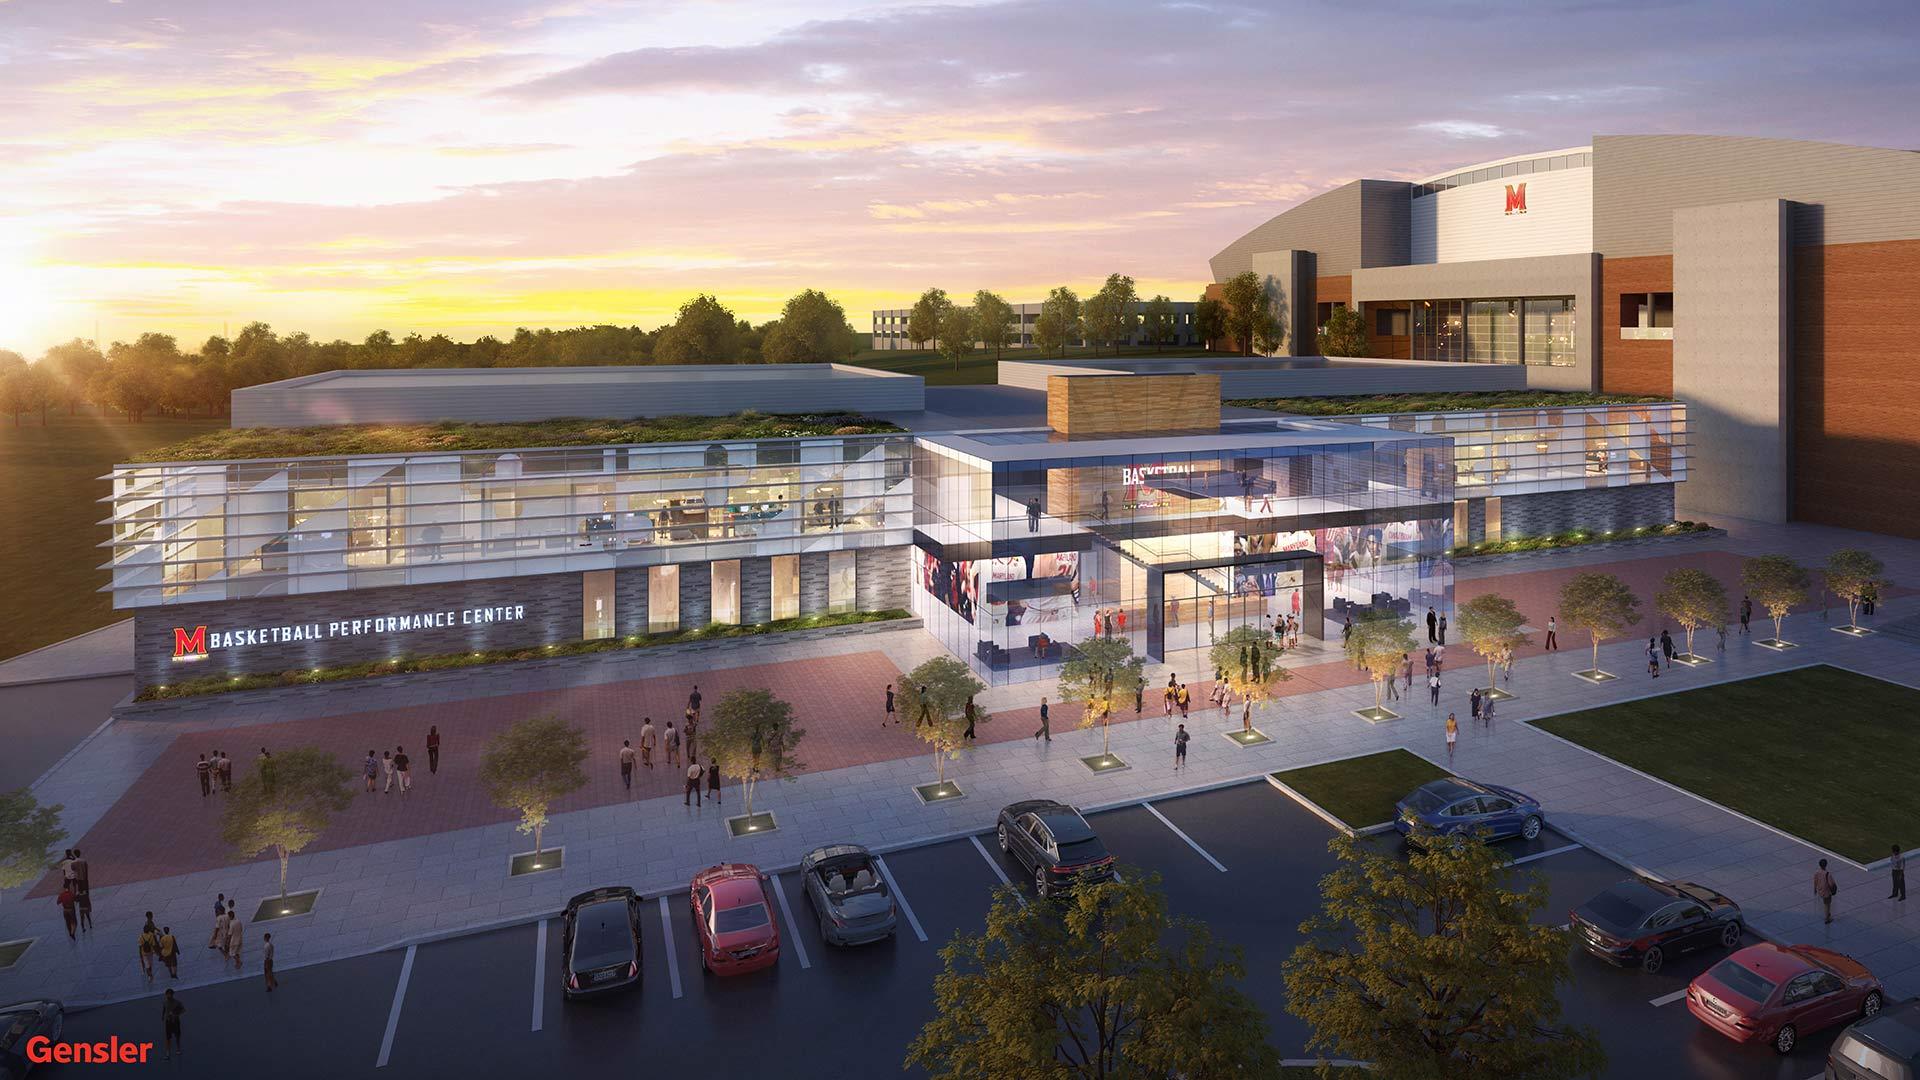 University of Maryland Basketball Performance Center rendering